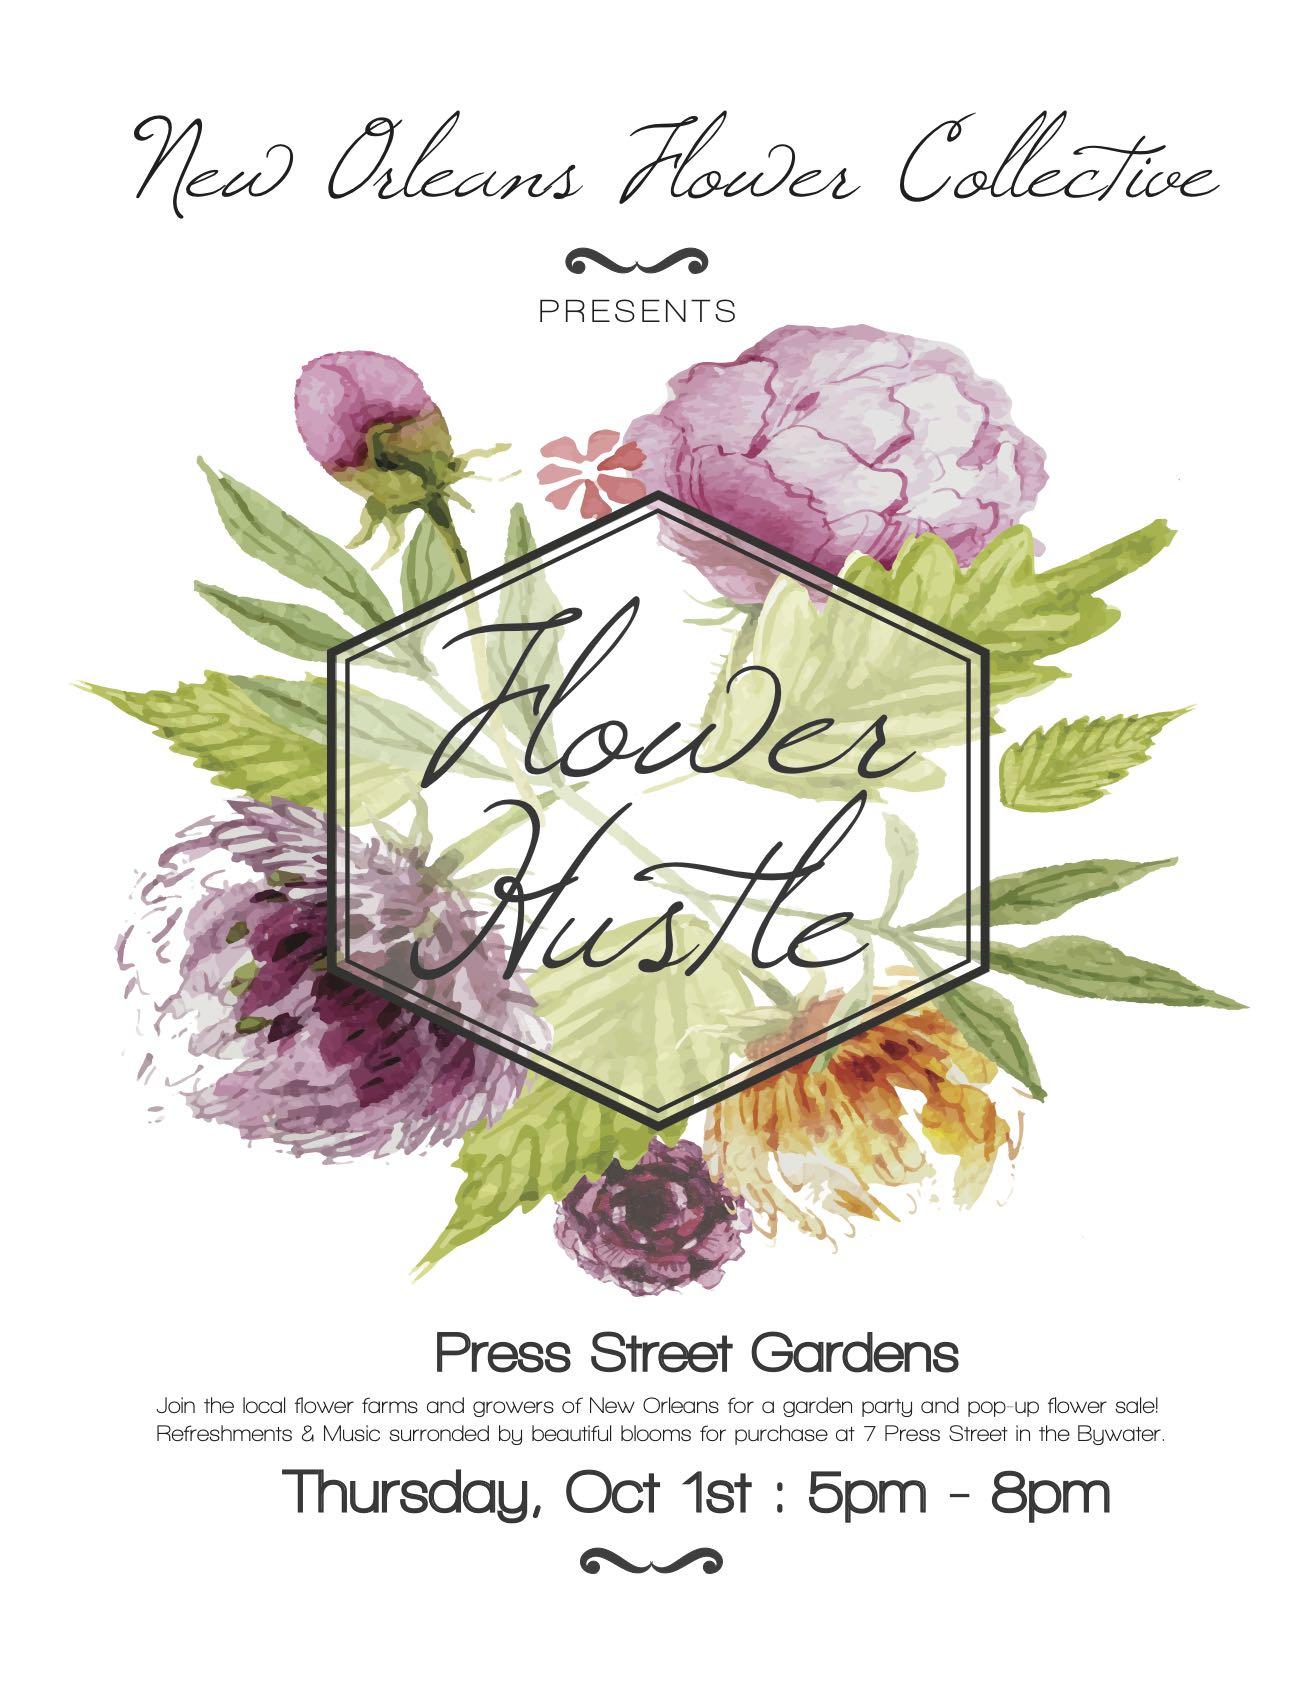 October 1: The New Orleans Flower Growers' Alliance Hosts FLOWER HUSTLE, A Flower Market At Press Street Gardens